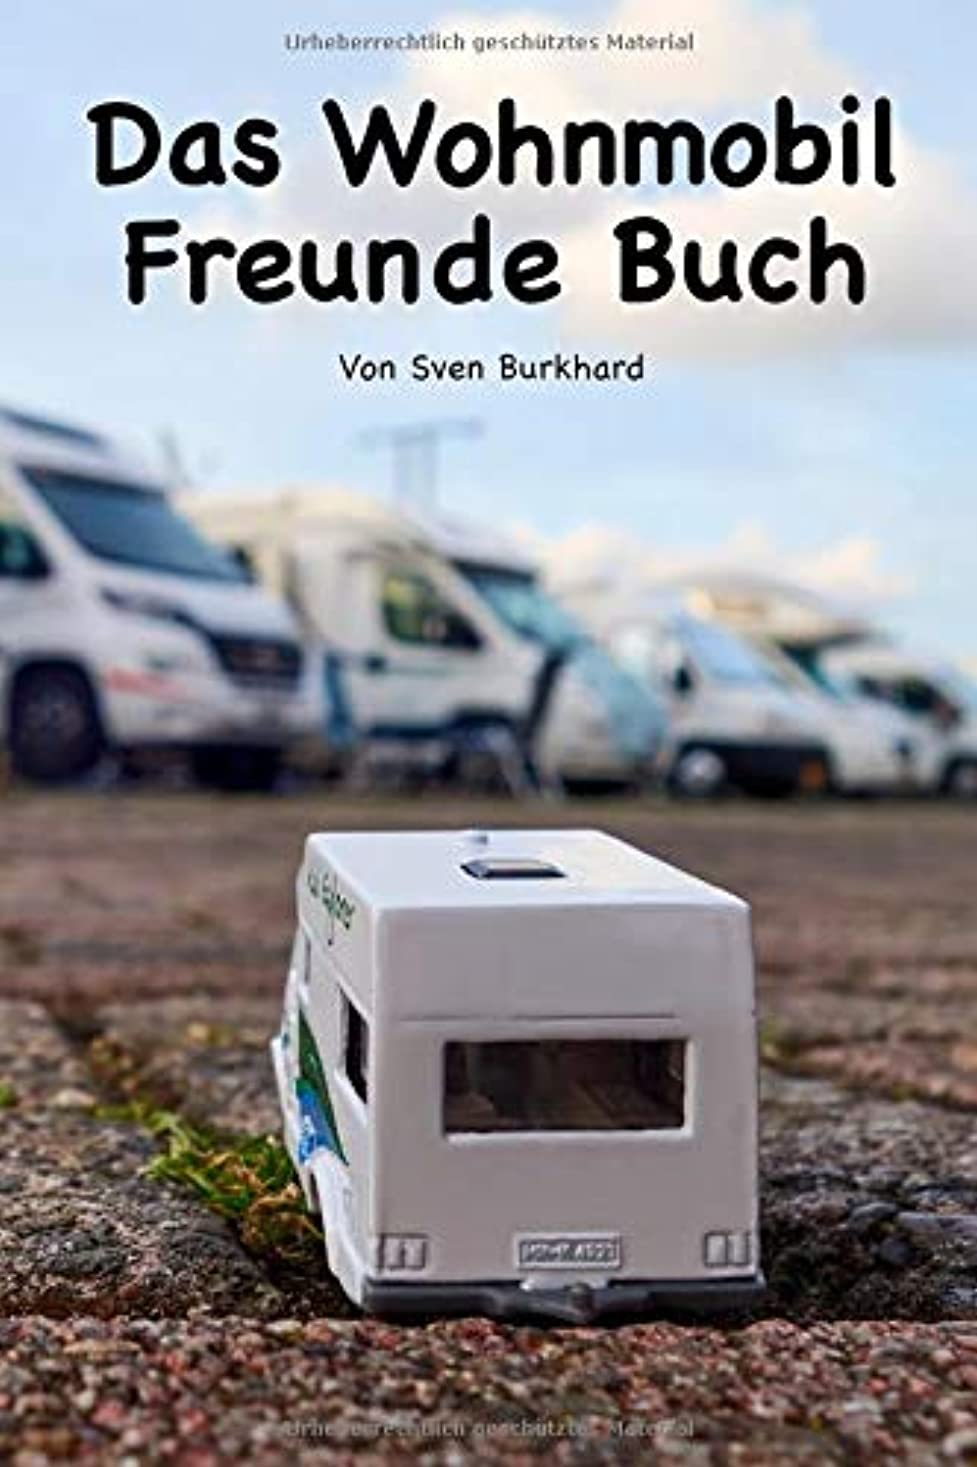 沼地道徳教育絶えずDas Wohnmobil Freunde Buch